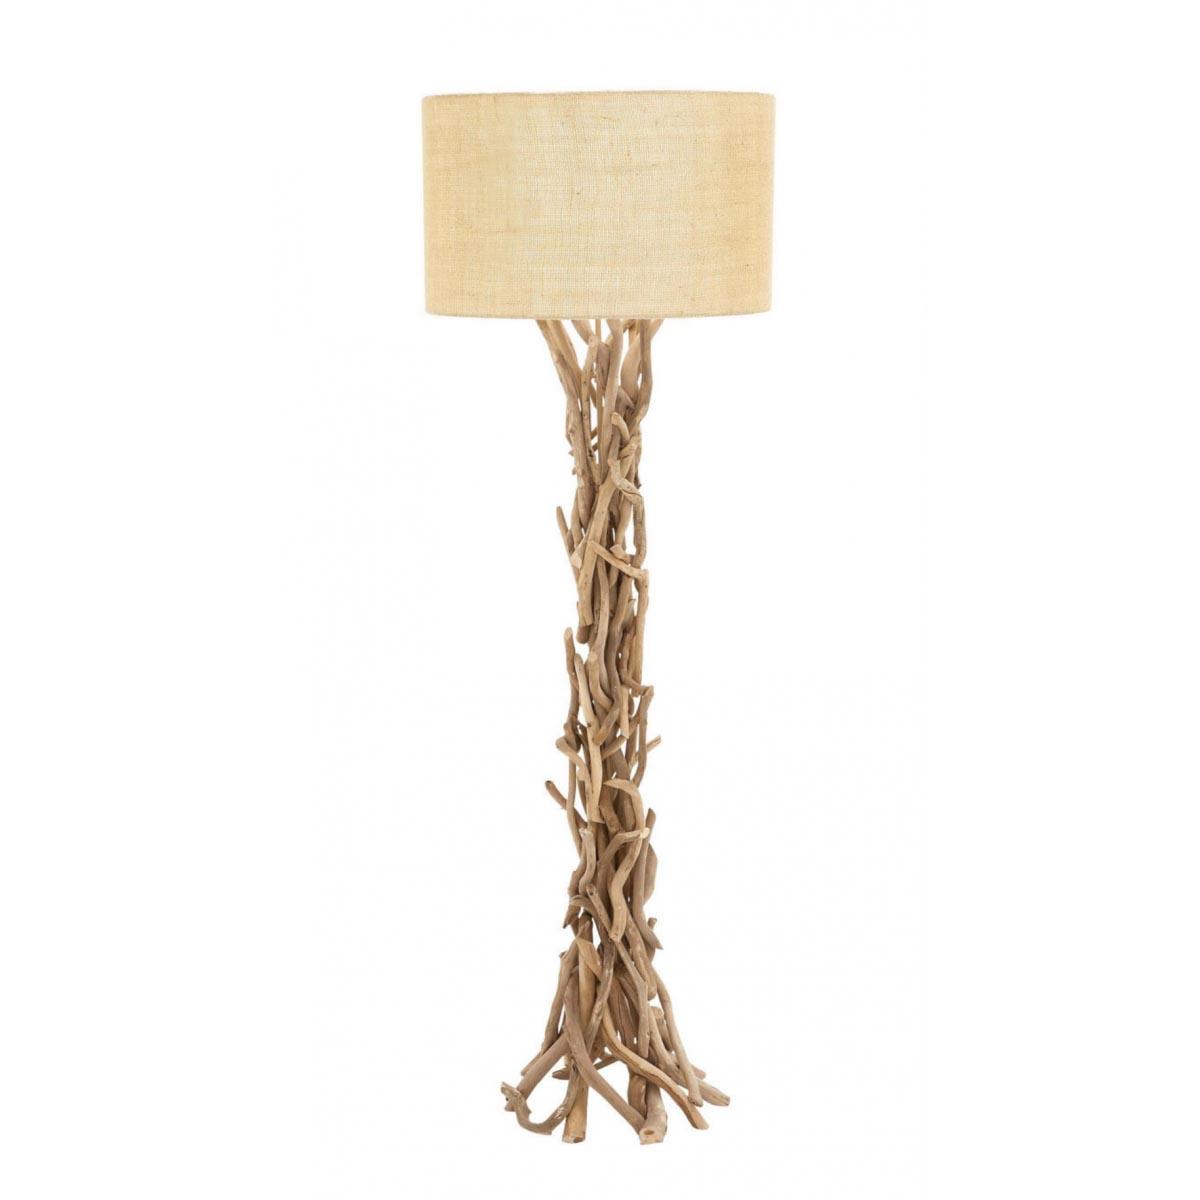 Nautical Themed Floor Lamps Light Fixtures Design Ideas